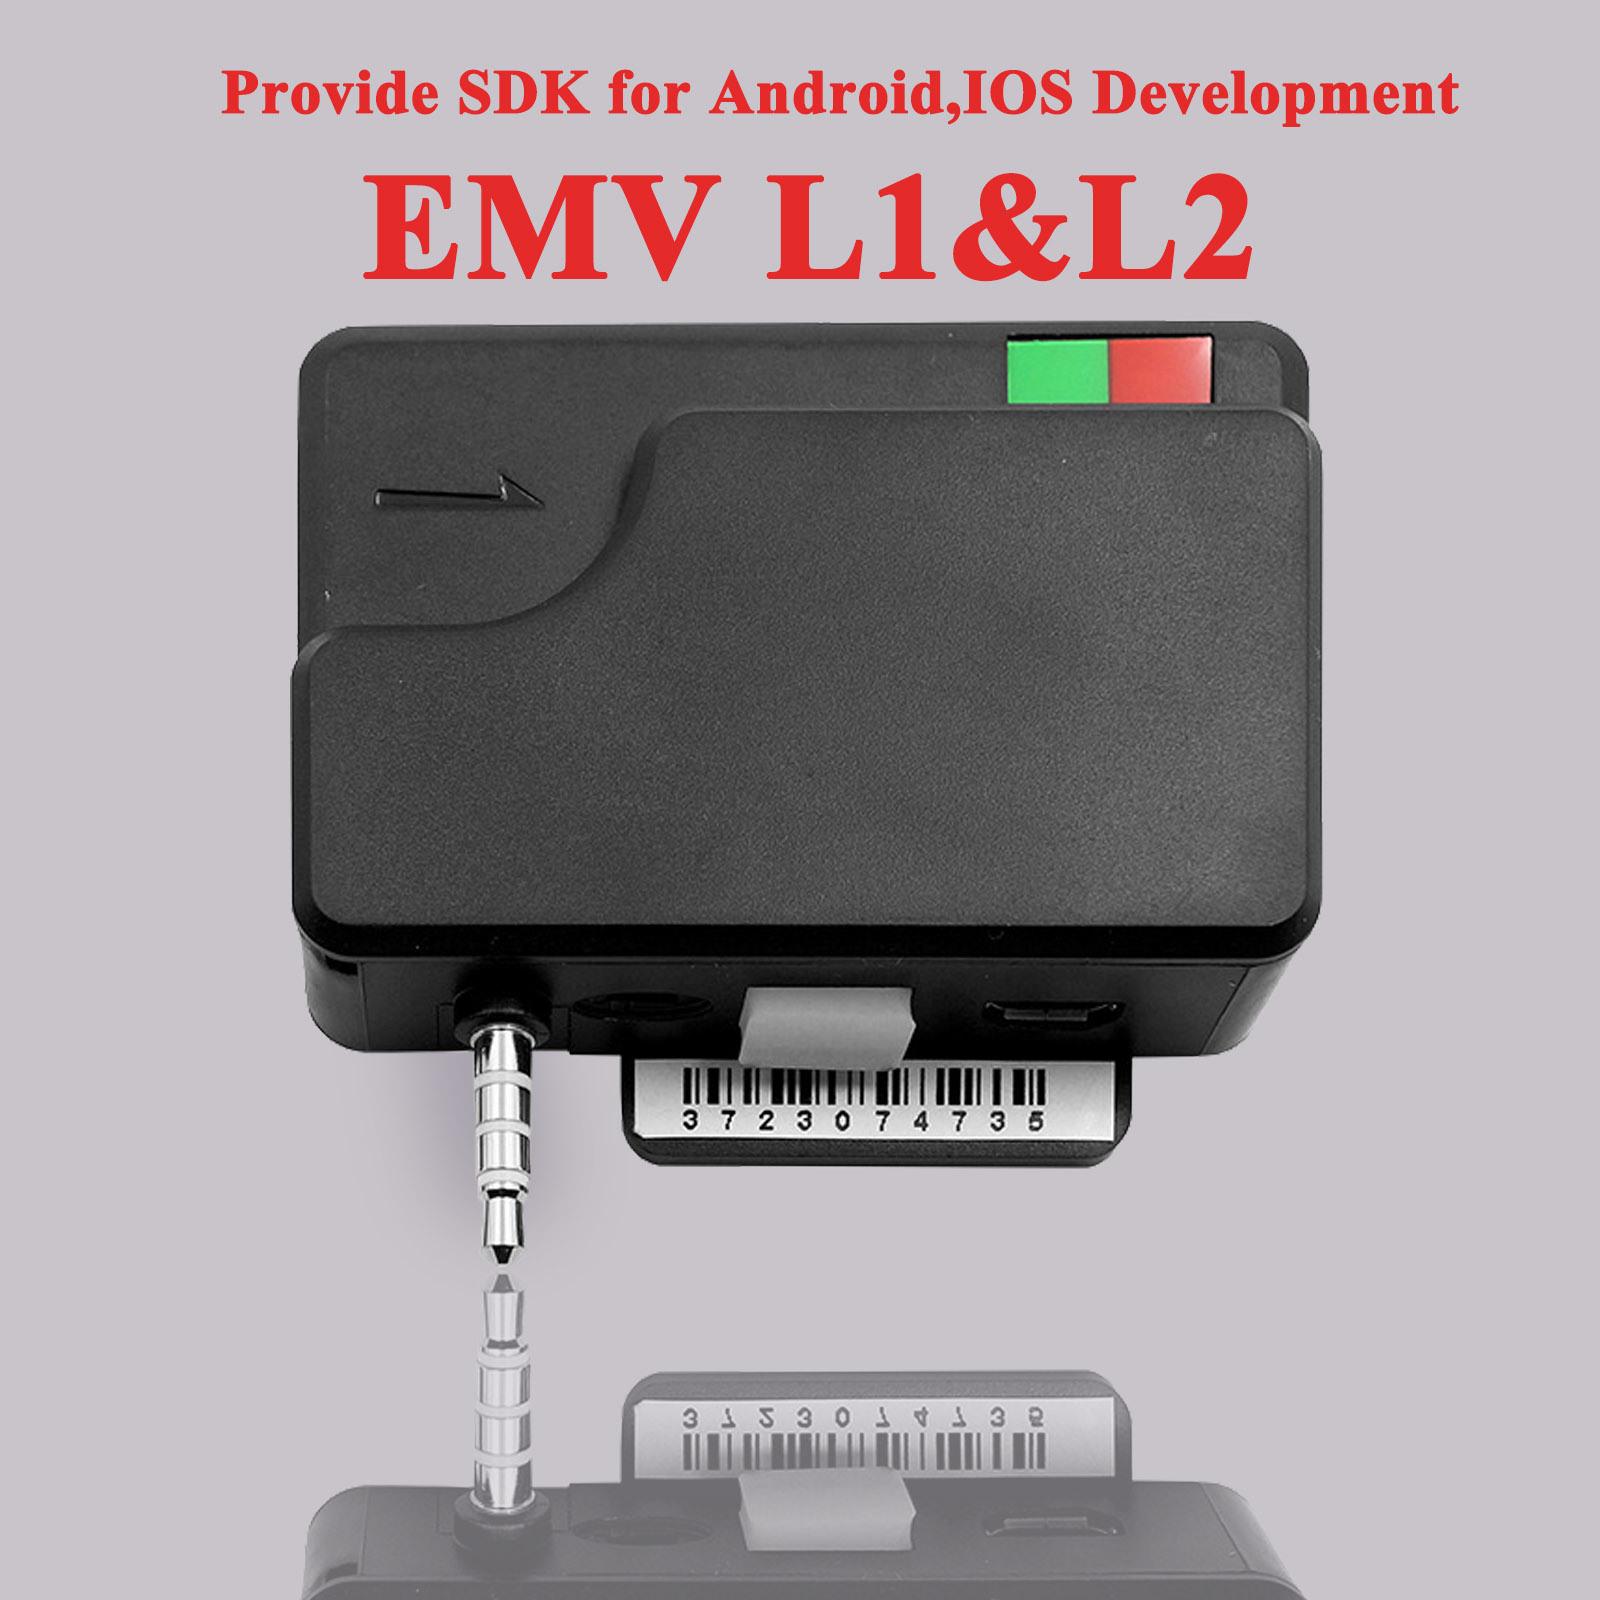 [Hot Item] EMV L1, L2 Imixpay Mobile Magnetic Card Reader with IC EMV Chip  Card Reader